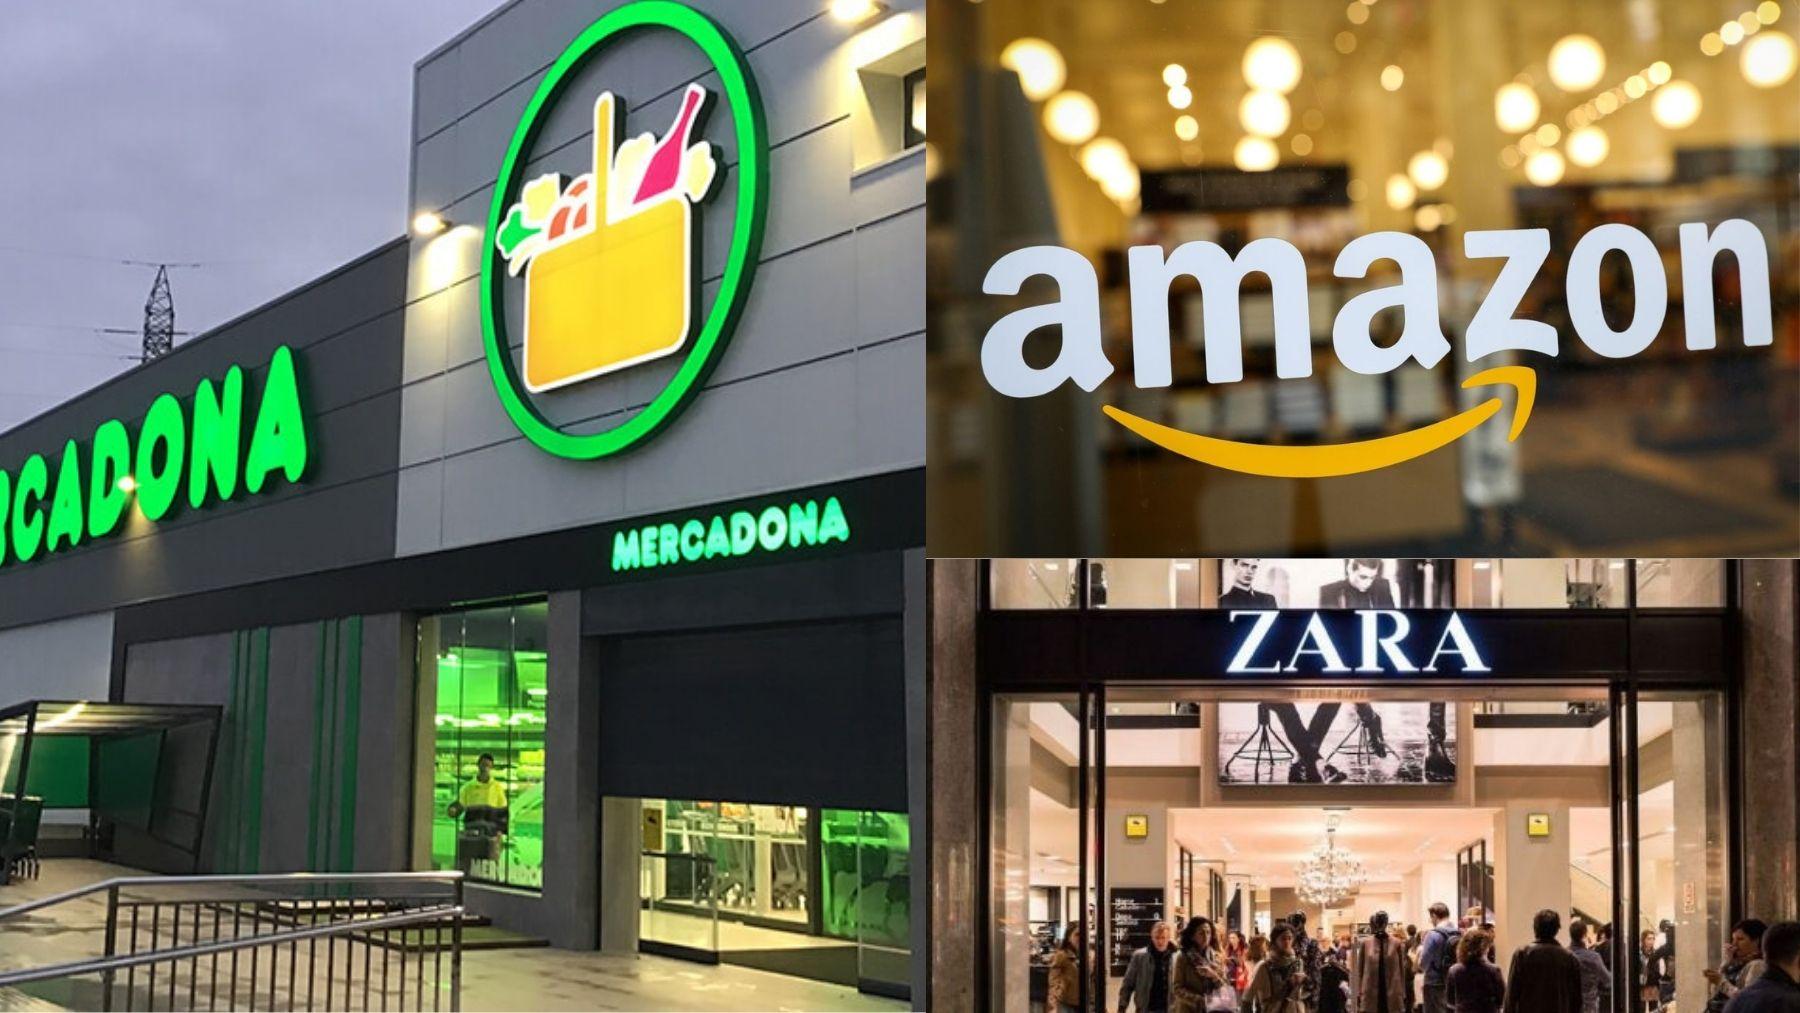 Historia del nombre de Mercadona, Amazon o Zara